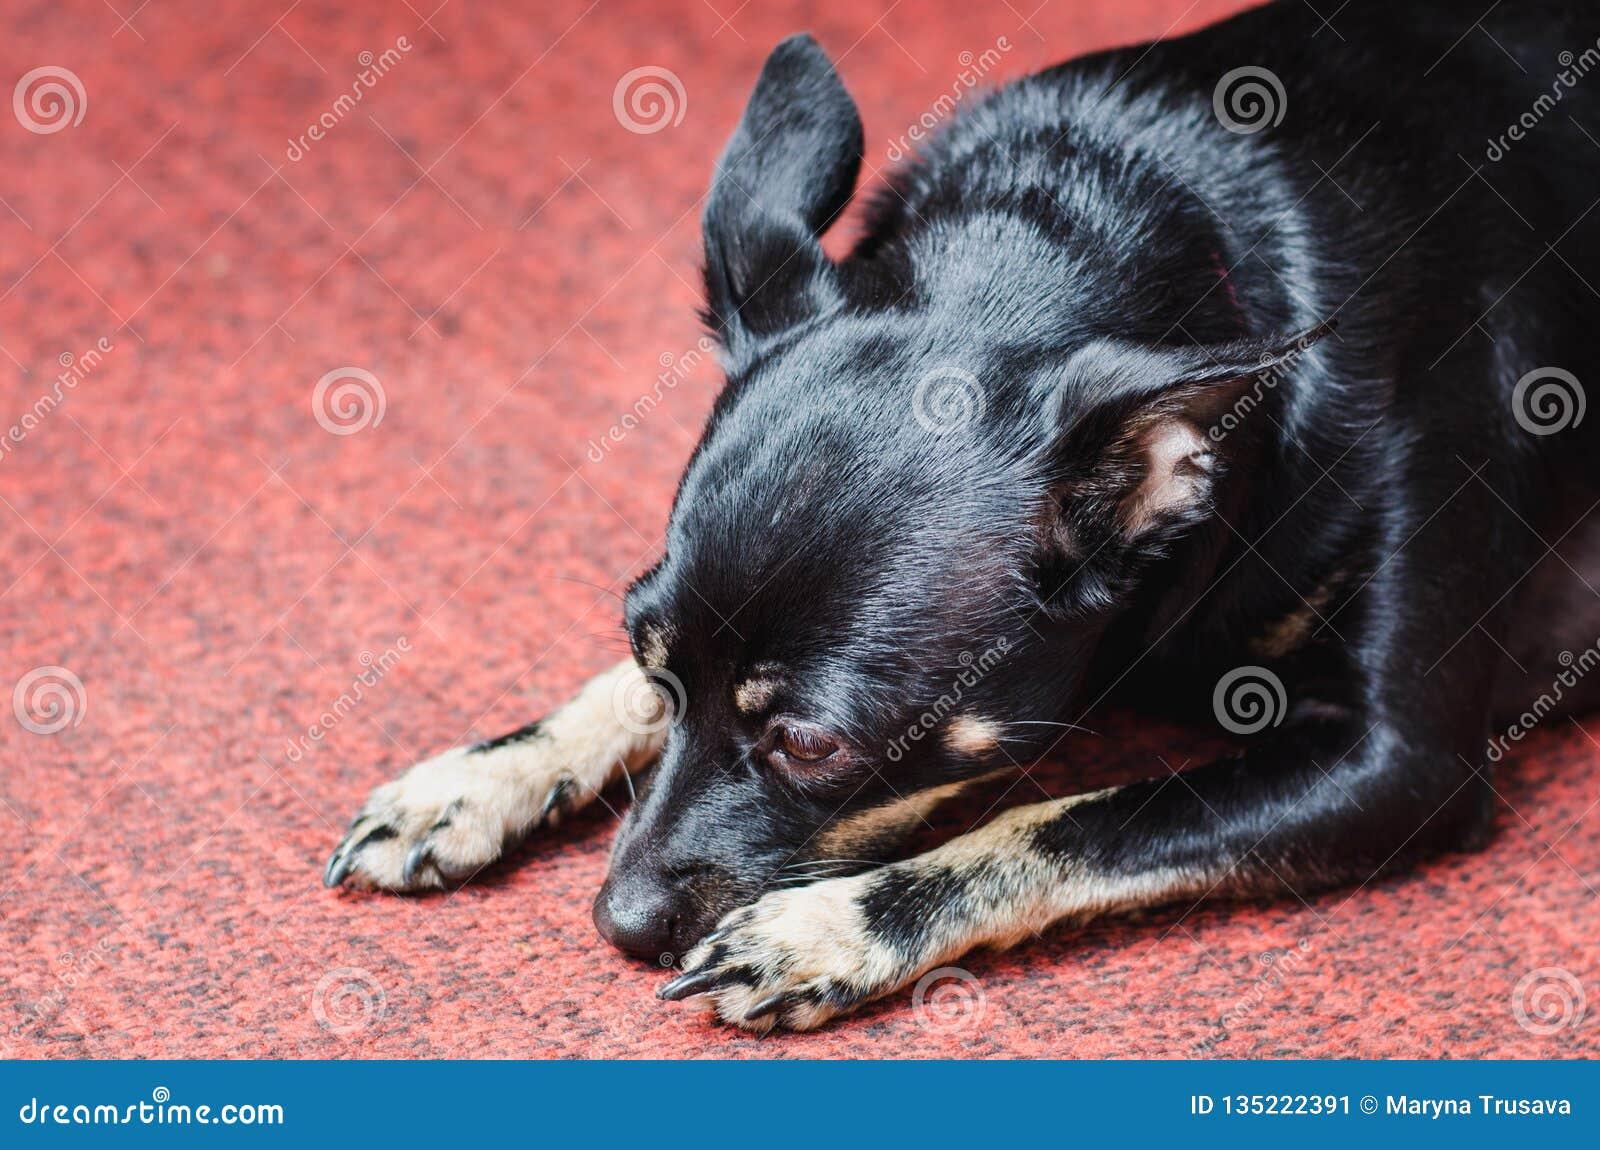 En liten svart slät-haired hund ligger på en rosa matta